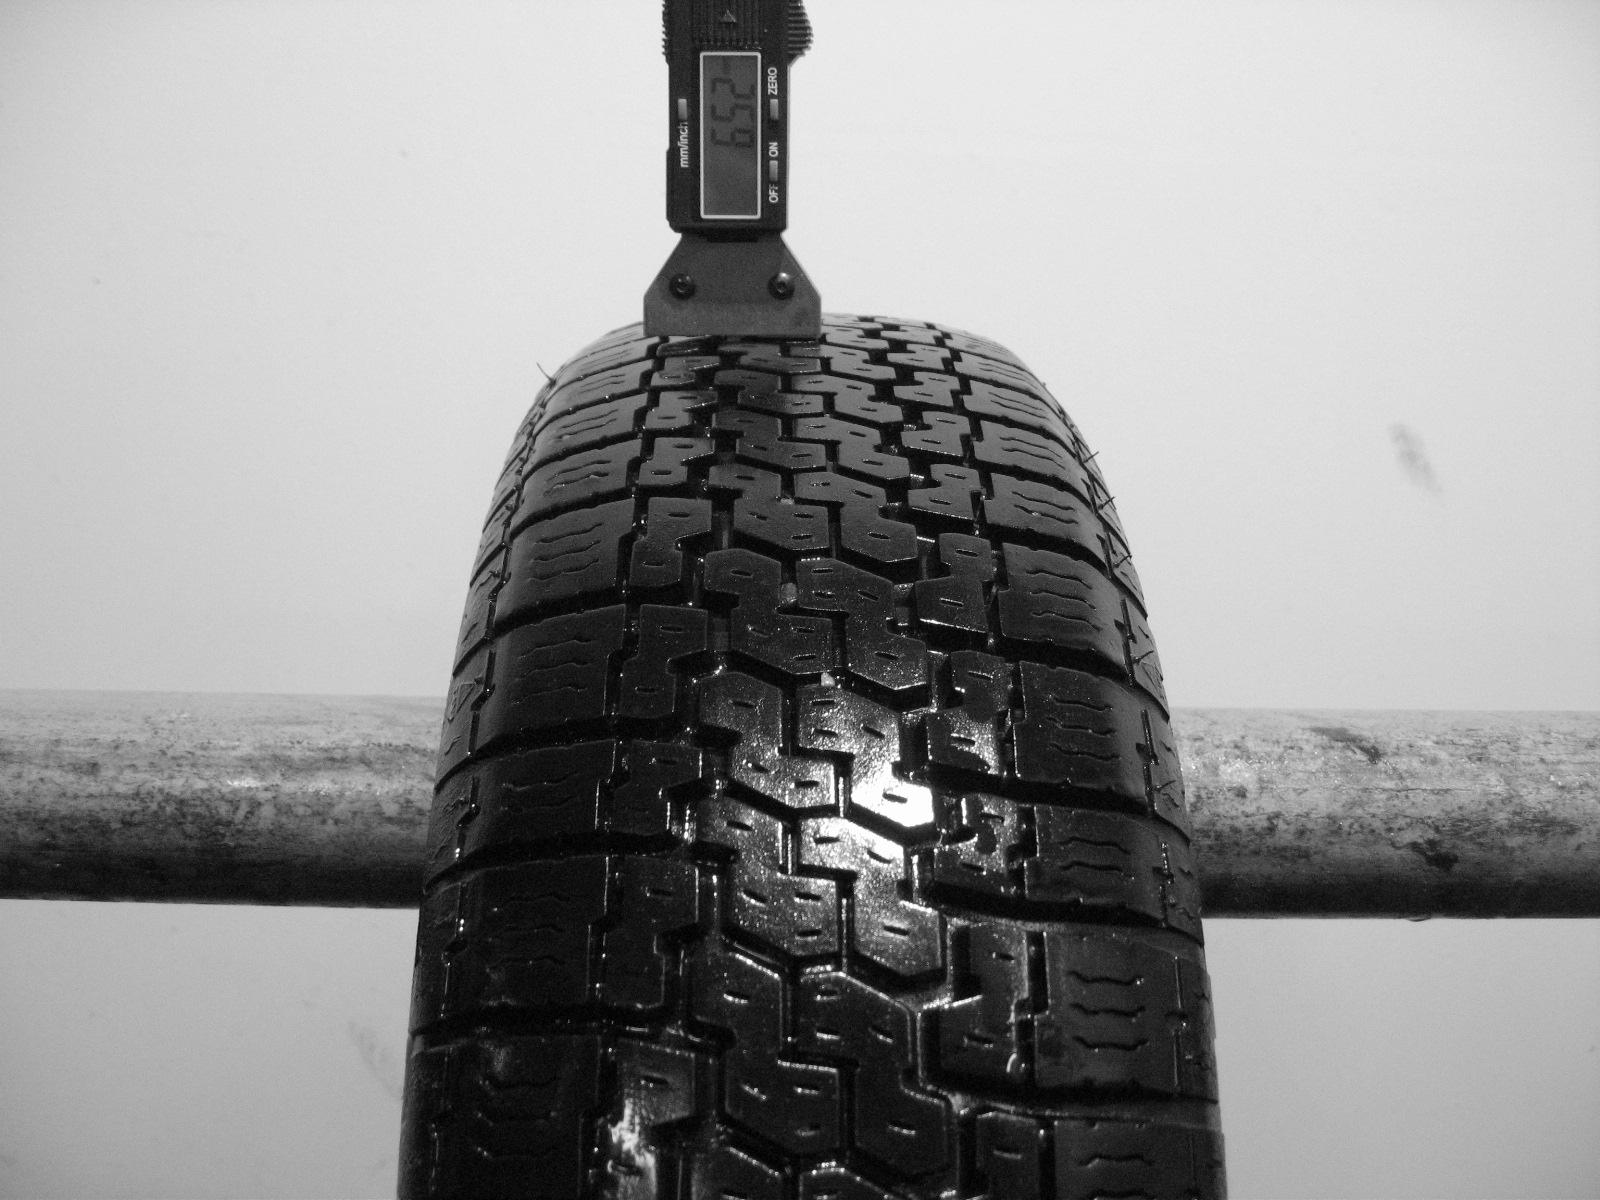 Použité-Pneu-Bazar - 165/65 R14 CONTINENTAL CONTACT CT21 -kusovka-rezerva 3mm